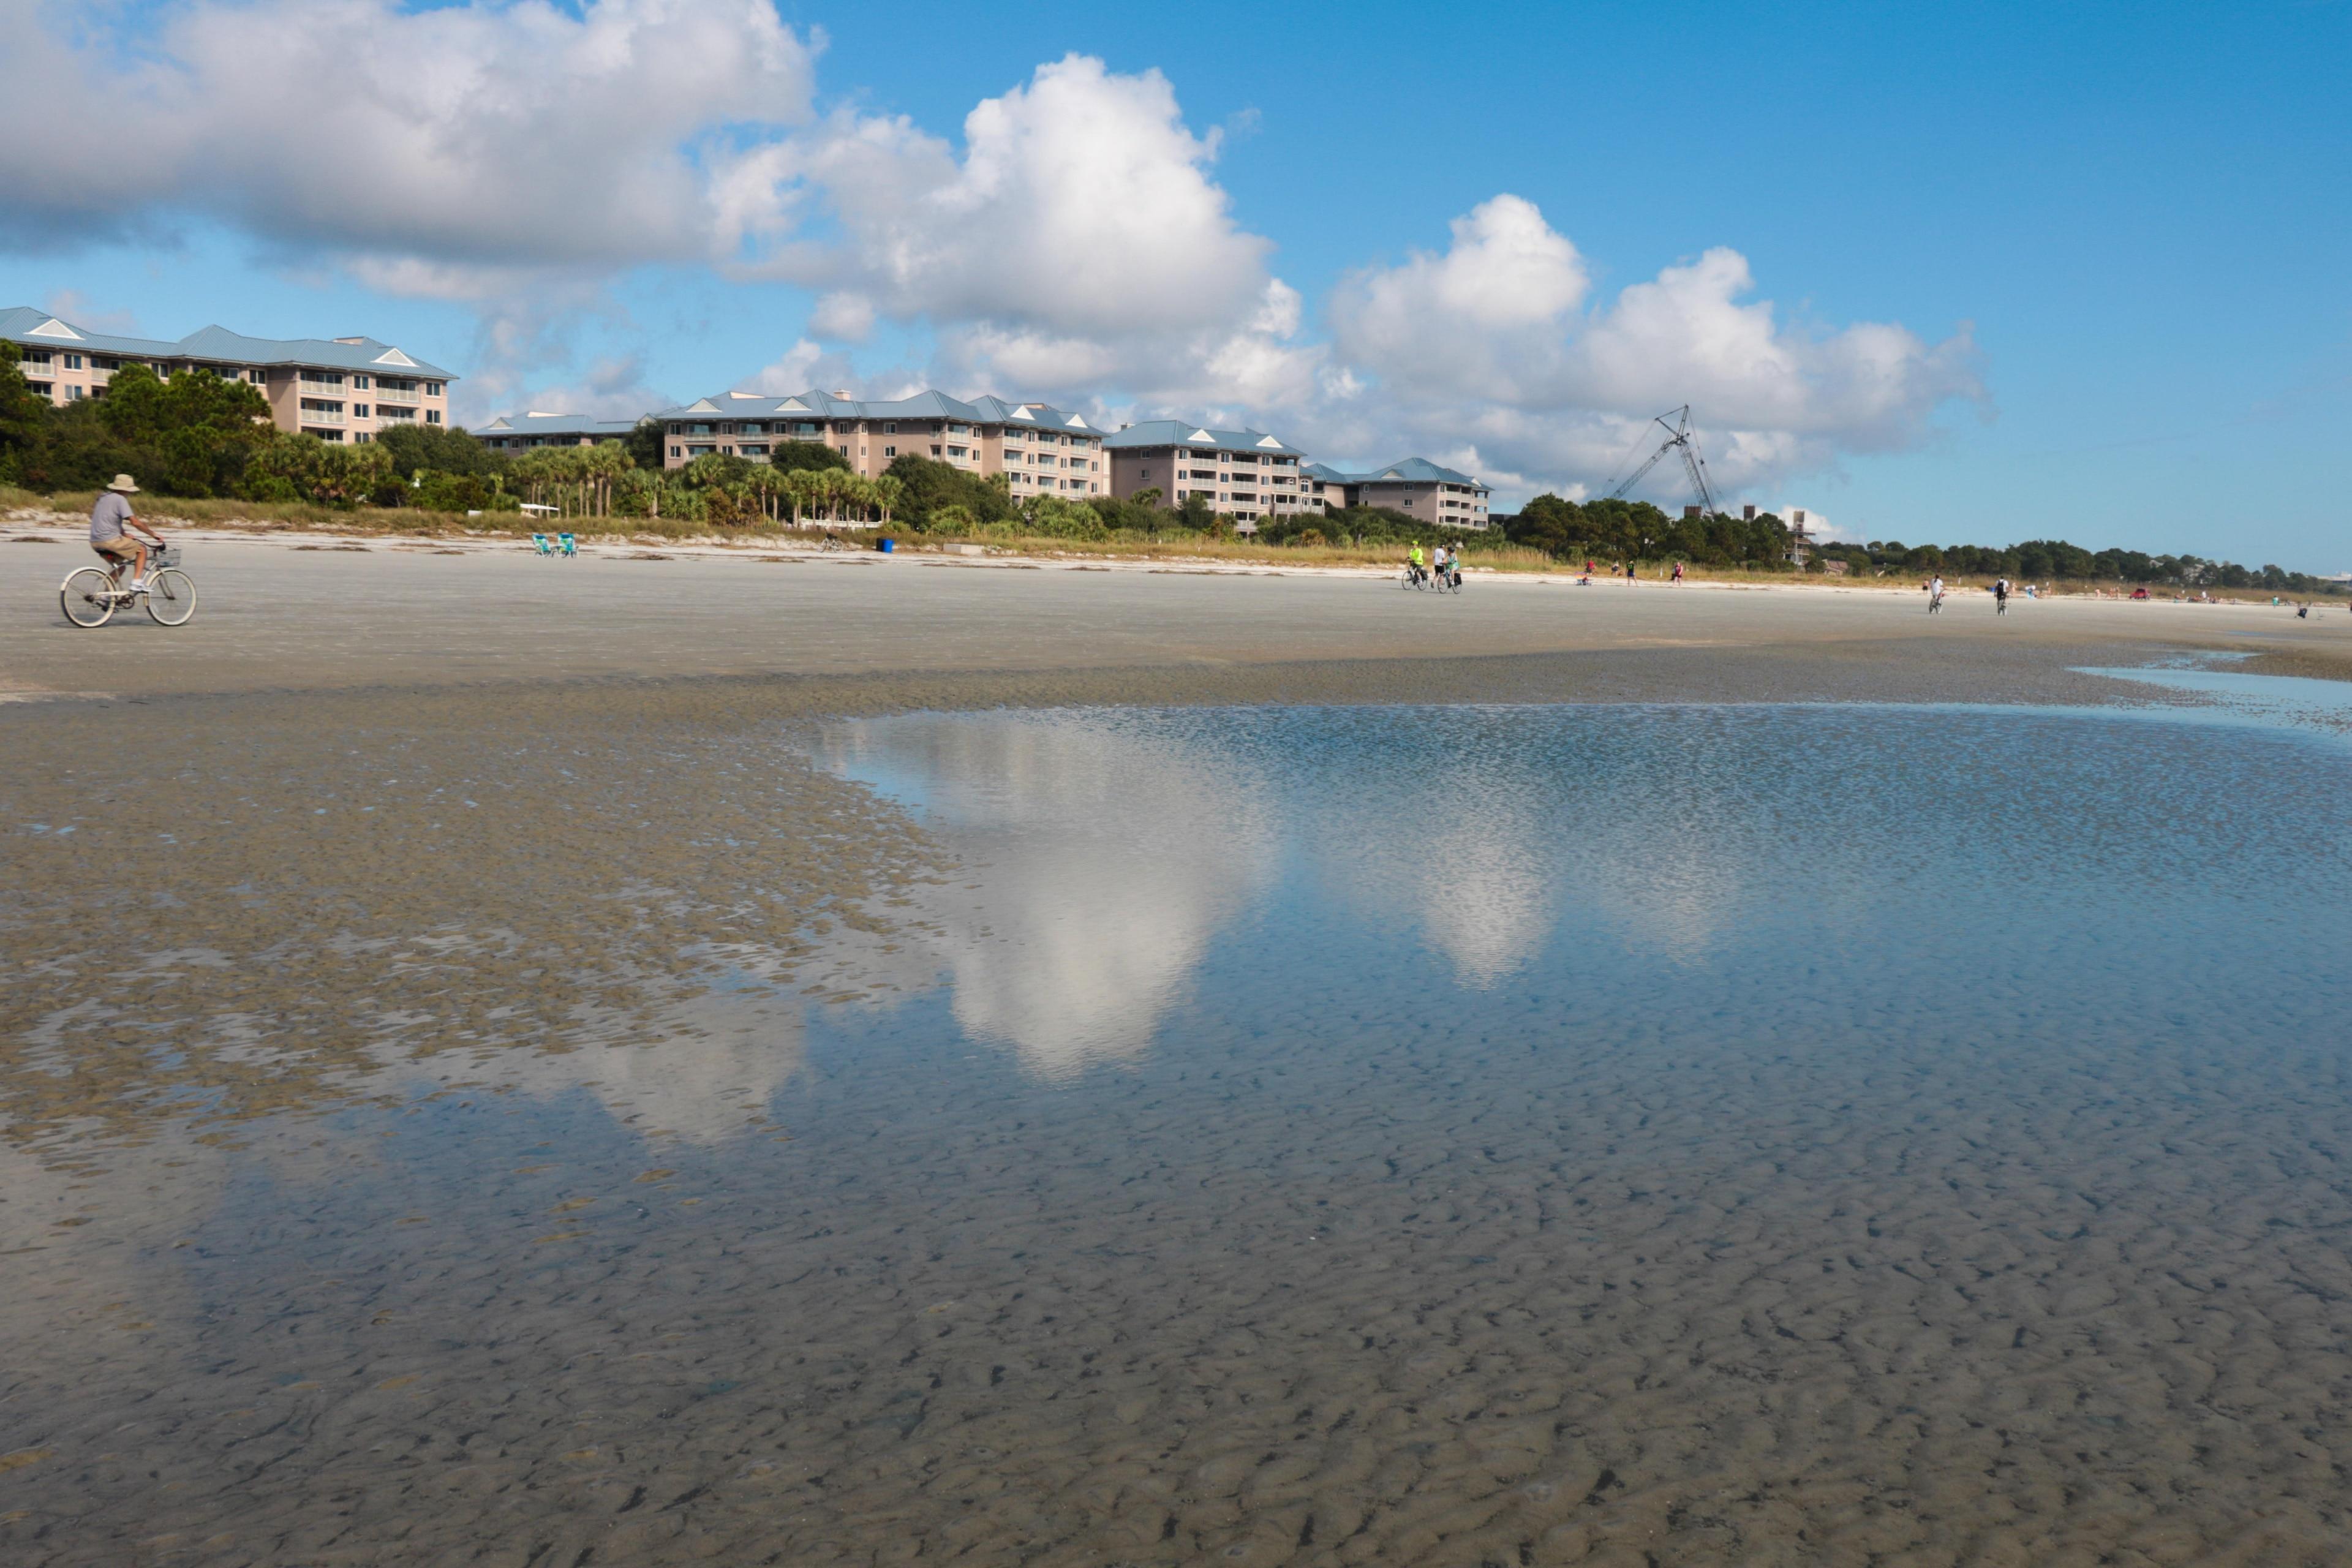 Coligny Beach, Hilton Head Island, South Carolina, United States of America